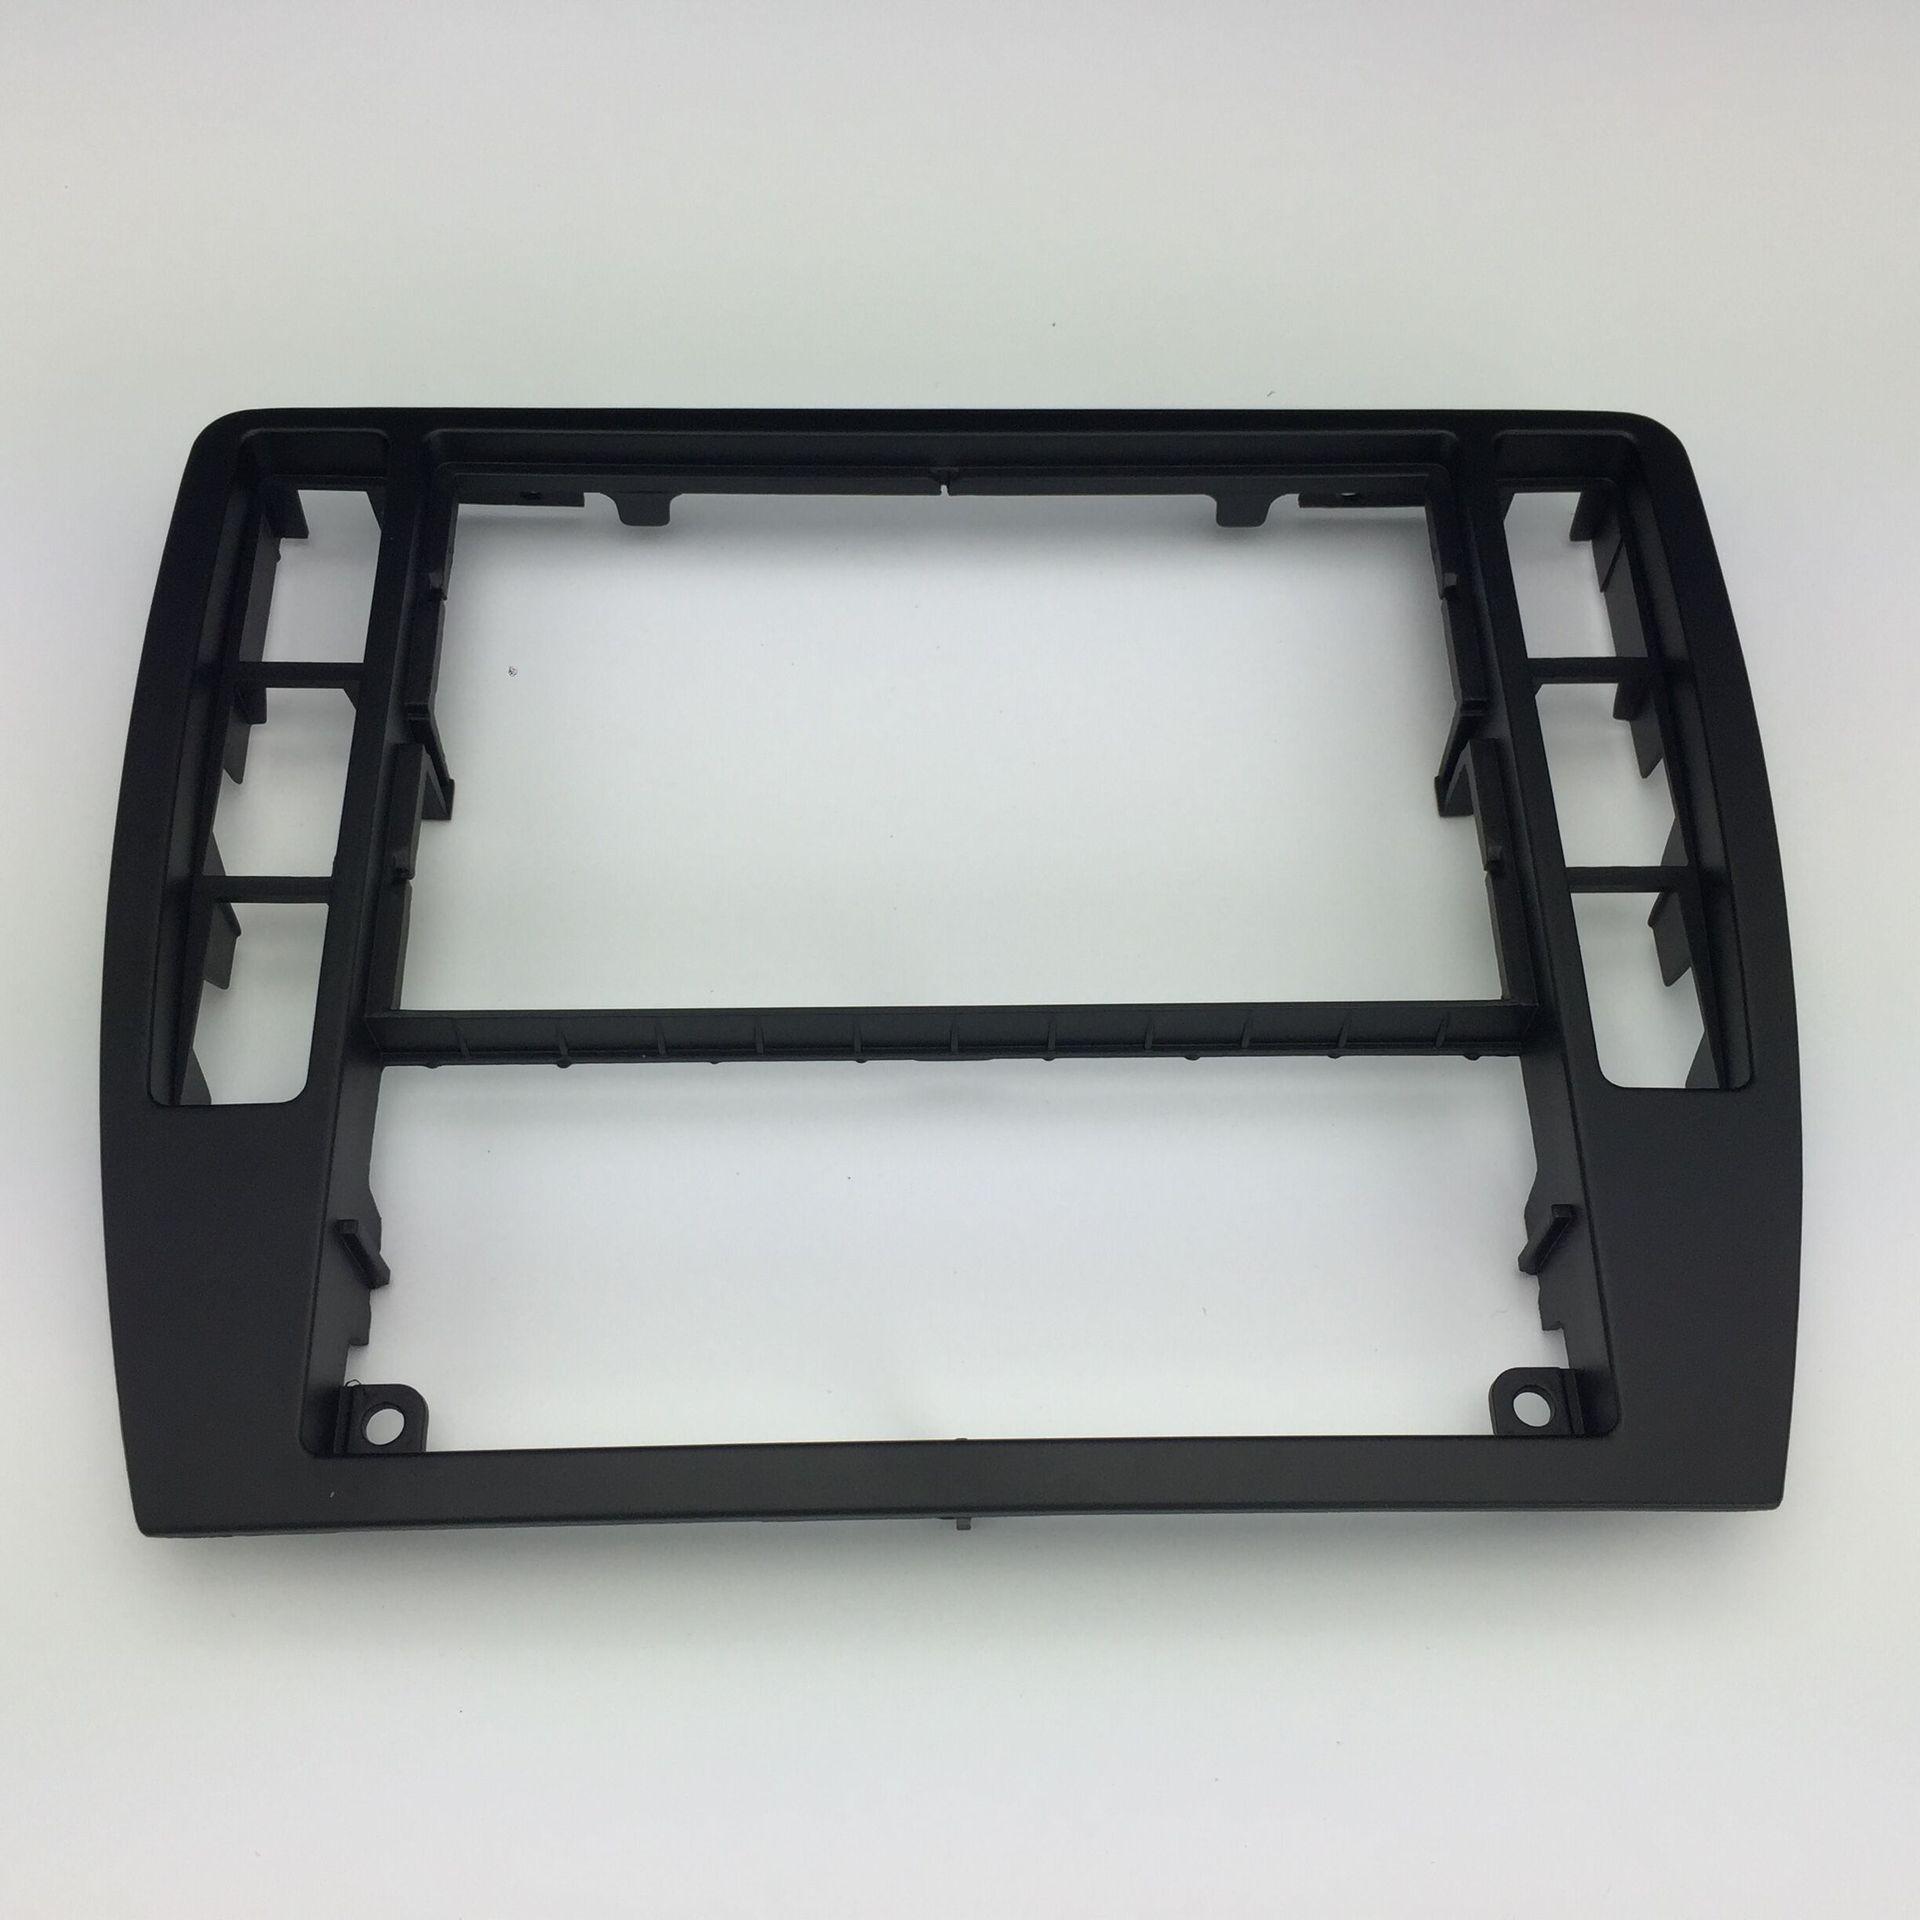 Auto Dash Center Console Trim Bezel Panel Decoratieve Frame Radio Gezicht Frame Voor Vw Passat B5 01-05 3B0 858 069 Auto Accessoires